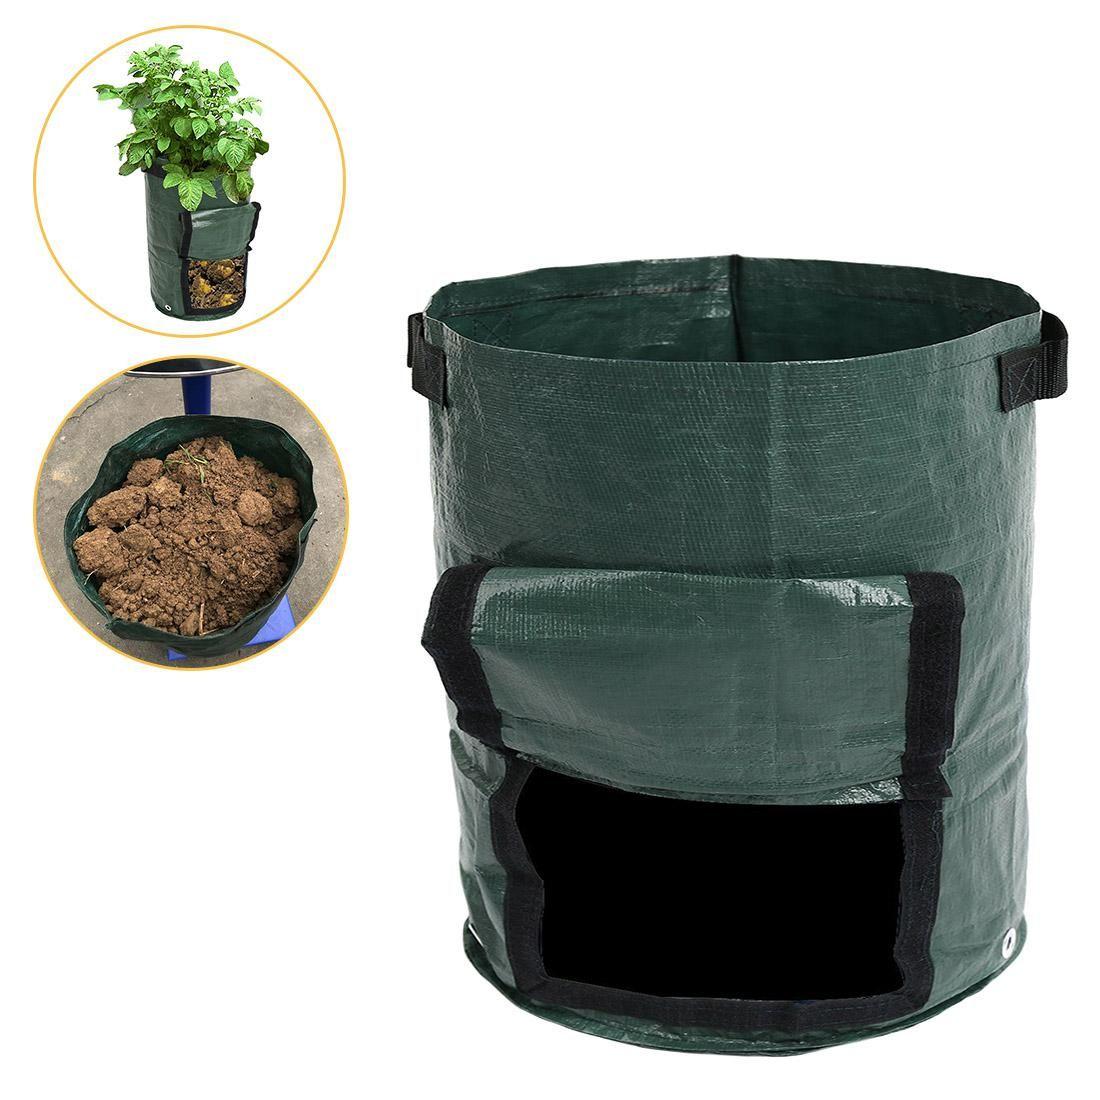 45*35cm Vegetable Plant Grow Bag DIY Potato Grow Planter